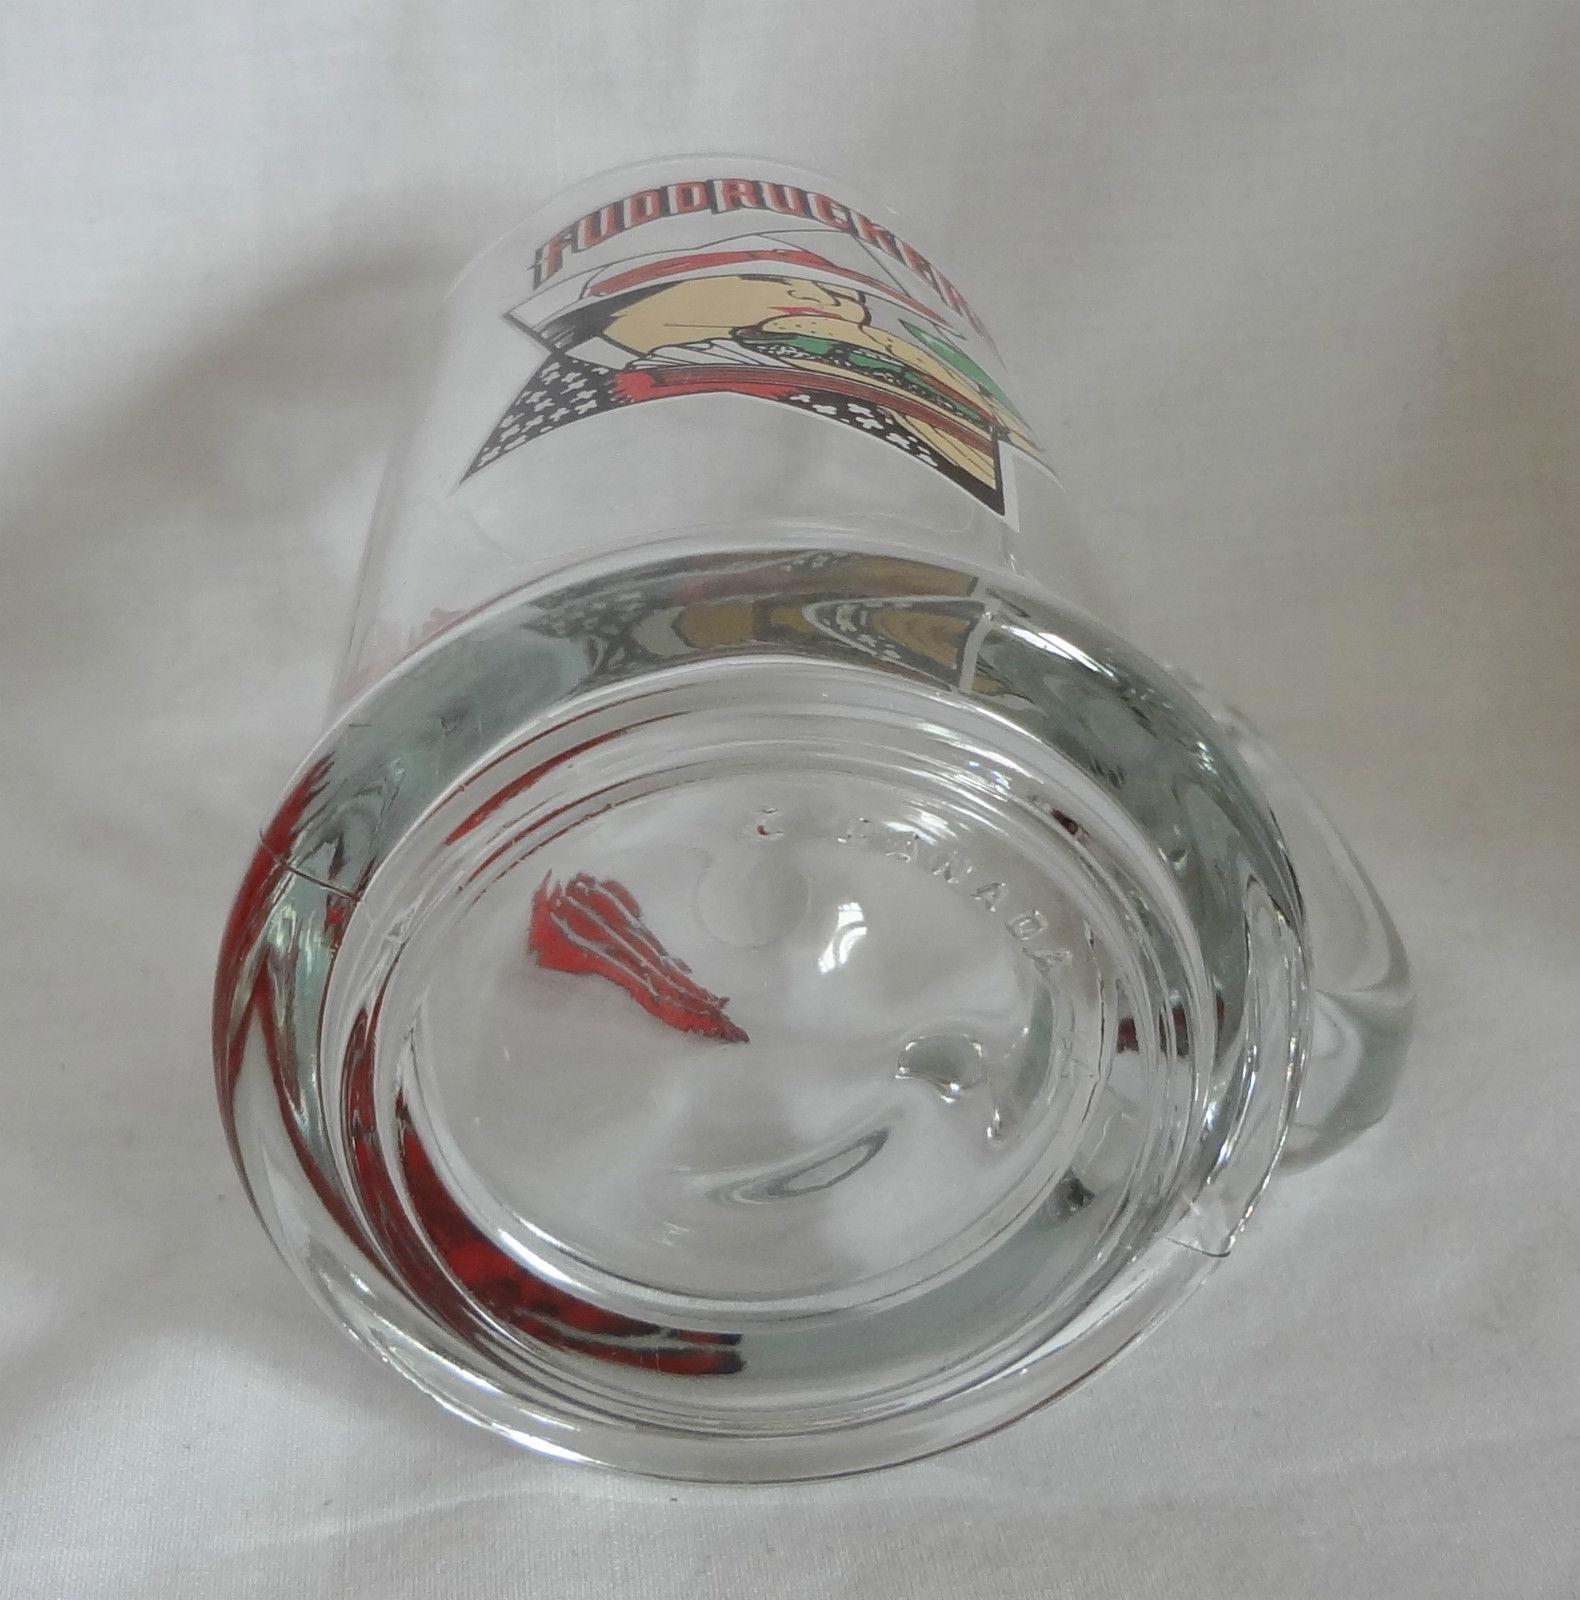 Fuddruckers The World's Greatest Hamburger 14 oz Glass Tankard Mug